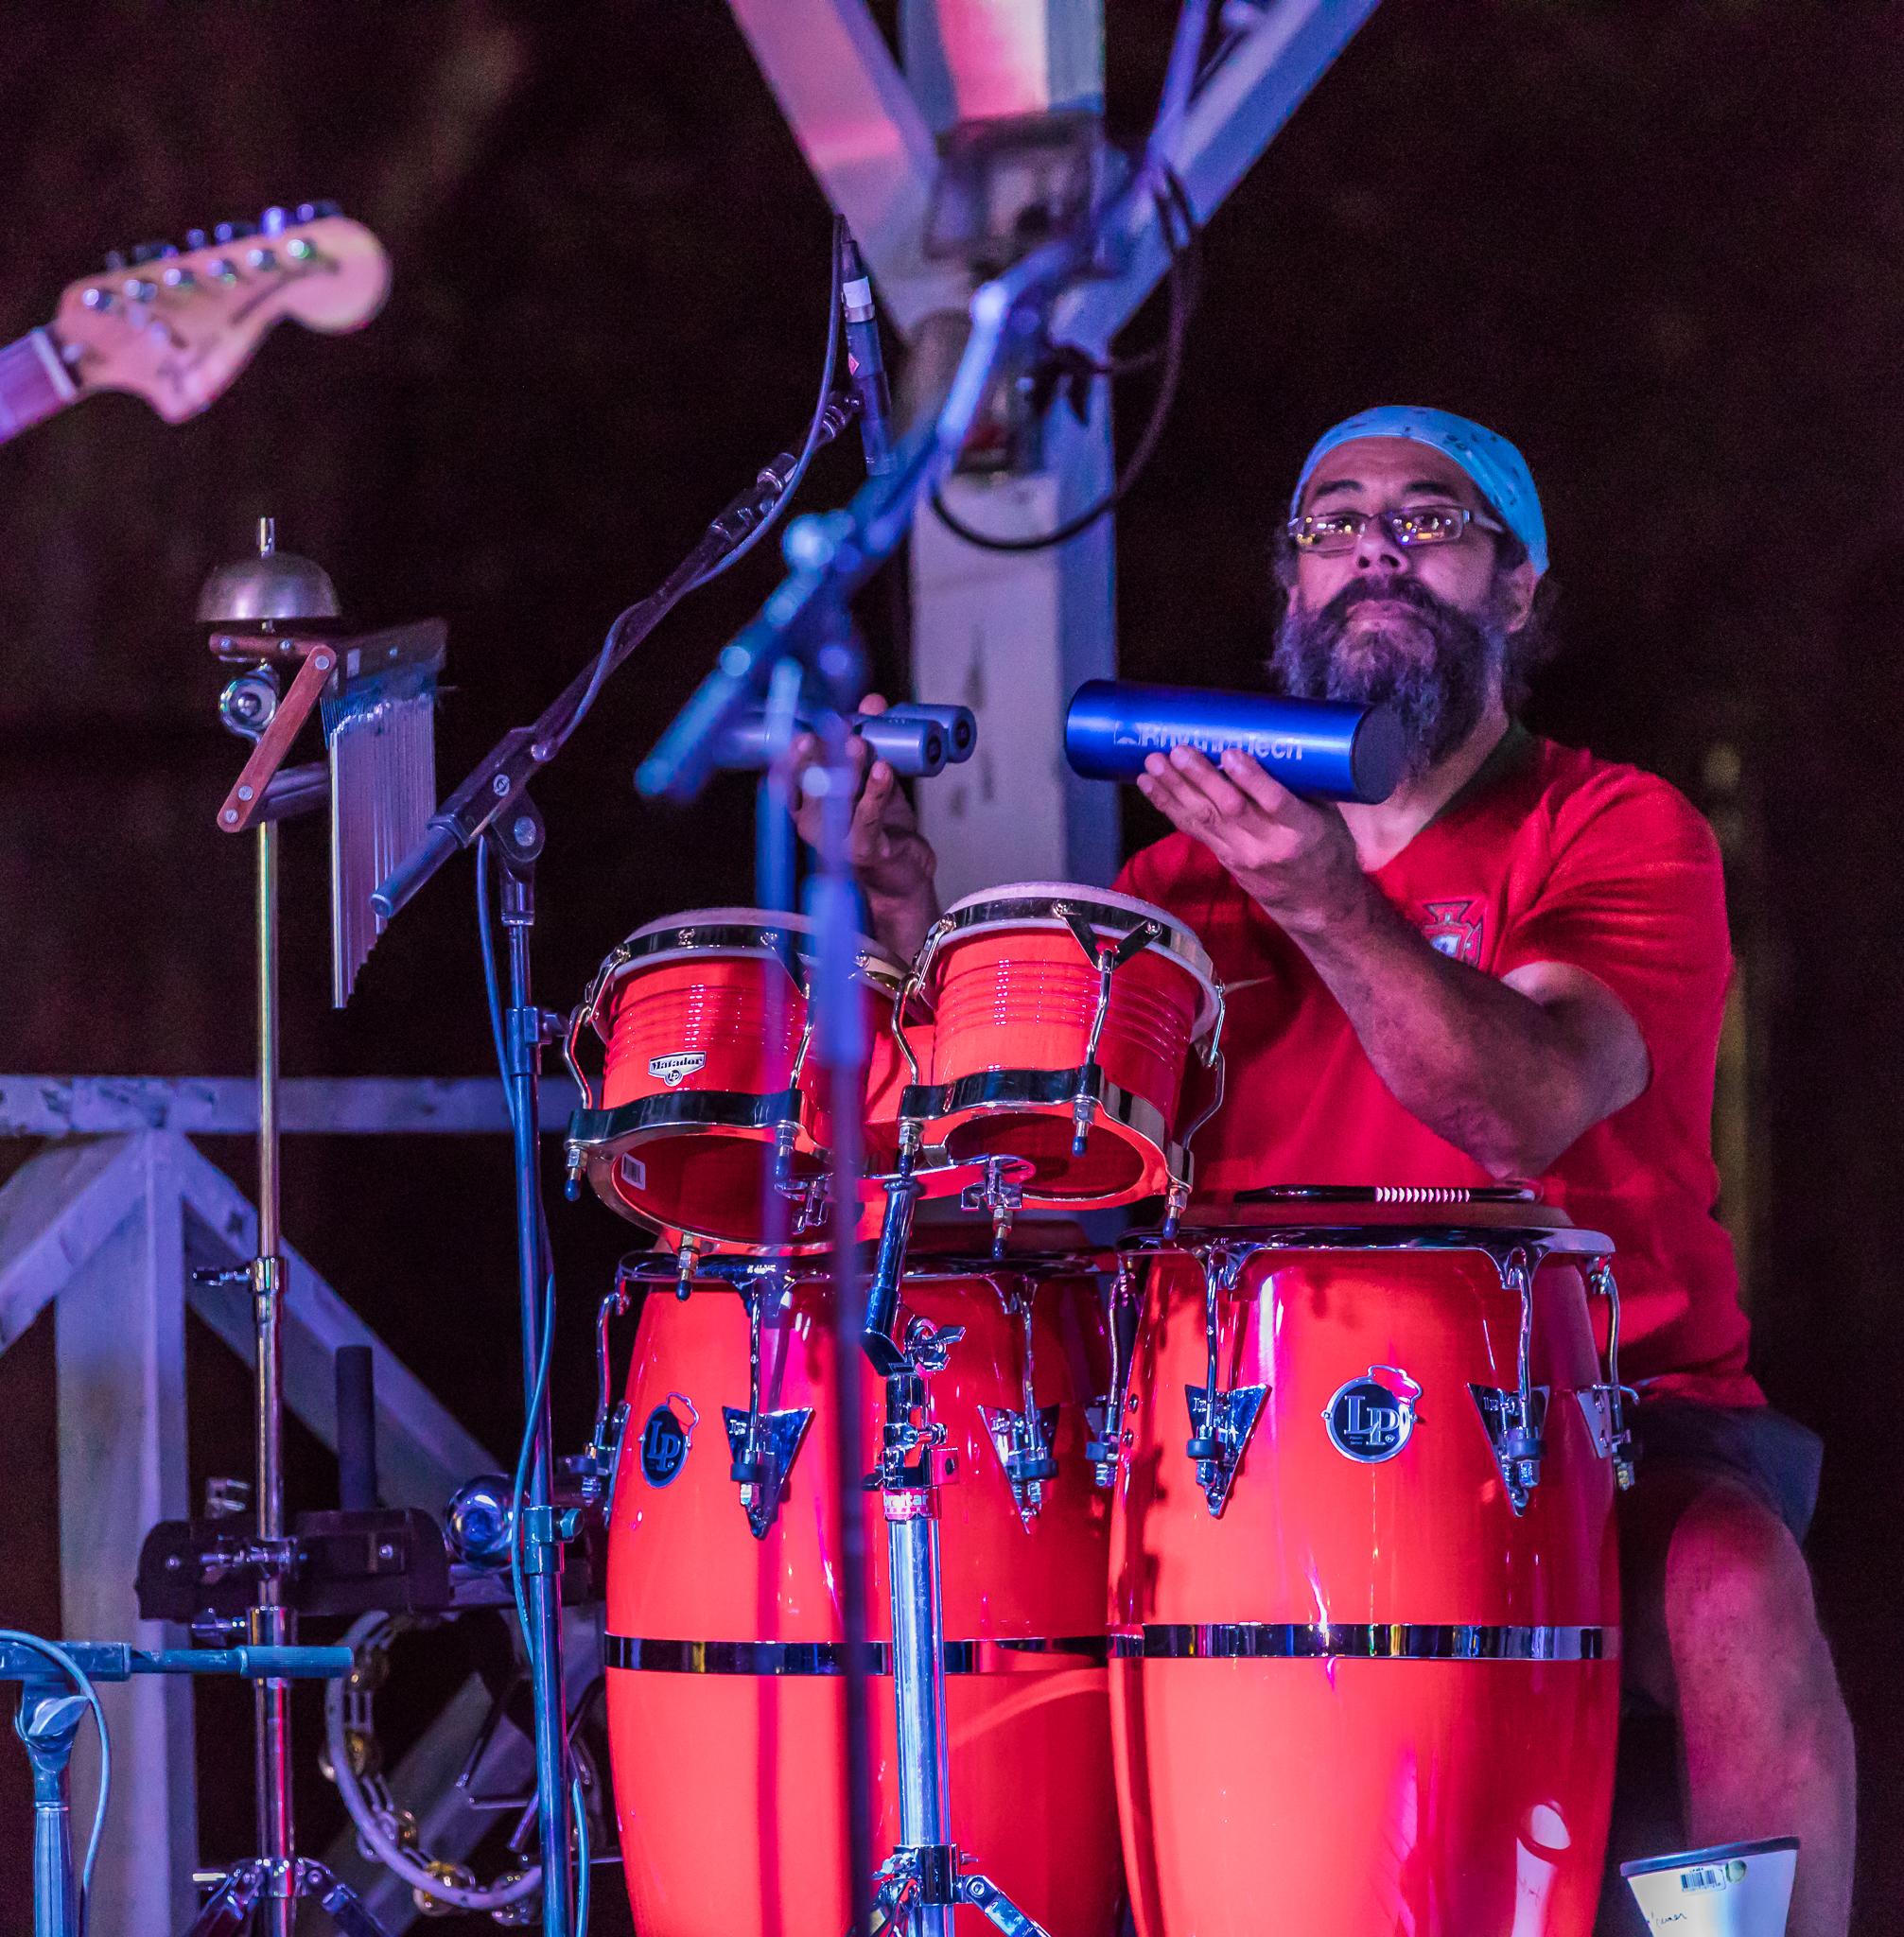 Xavier - Percussion